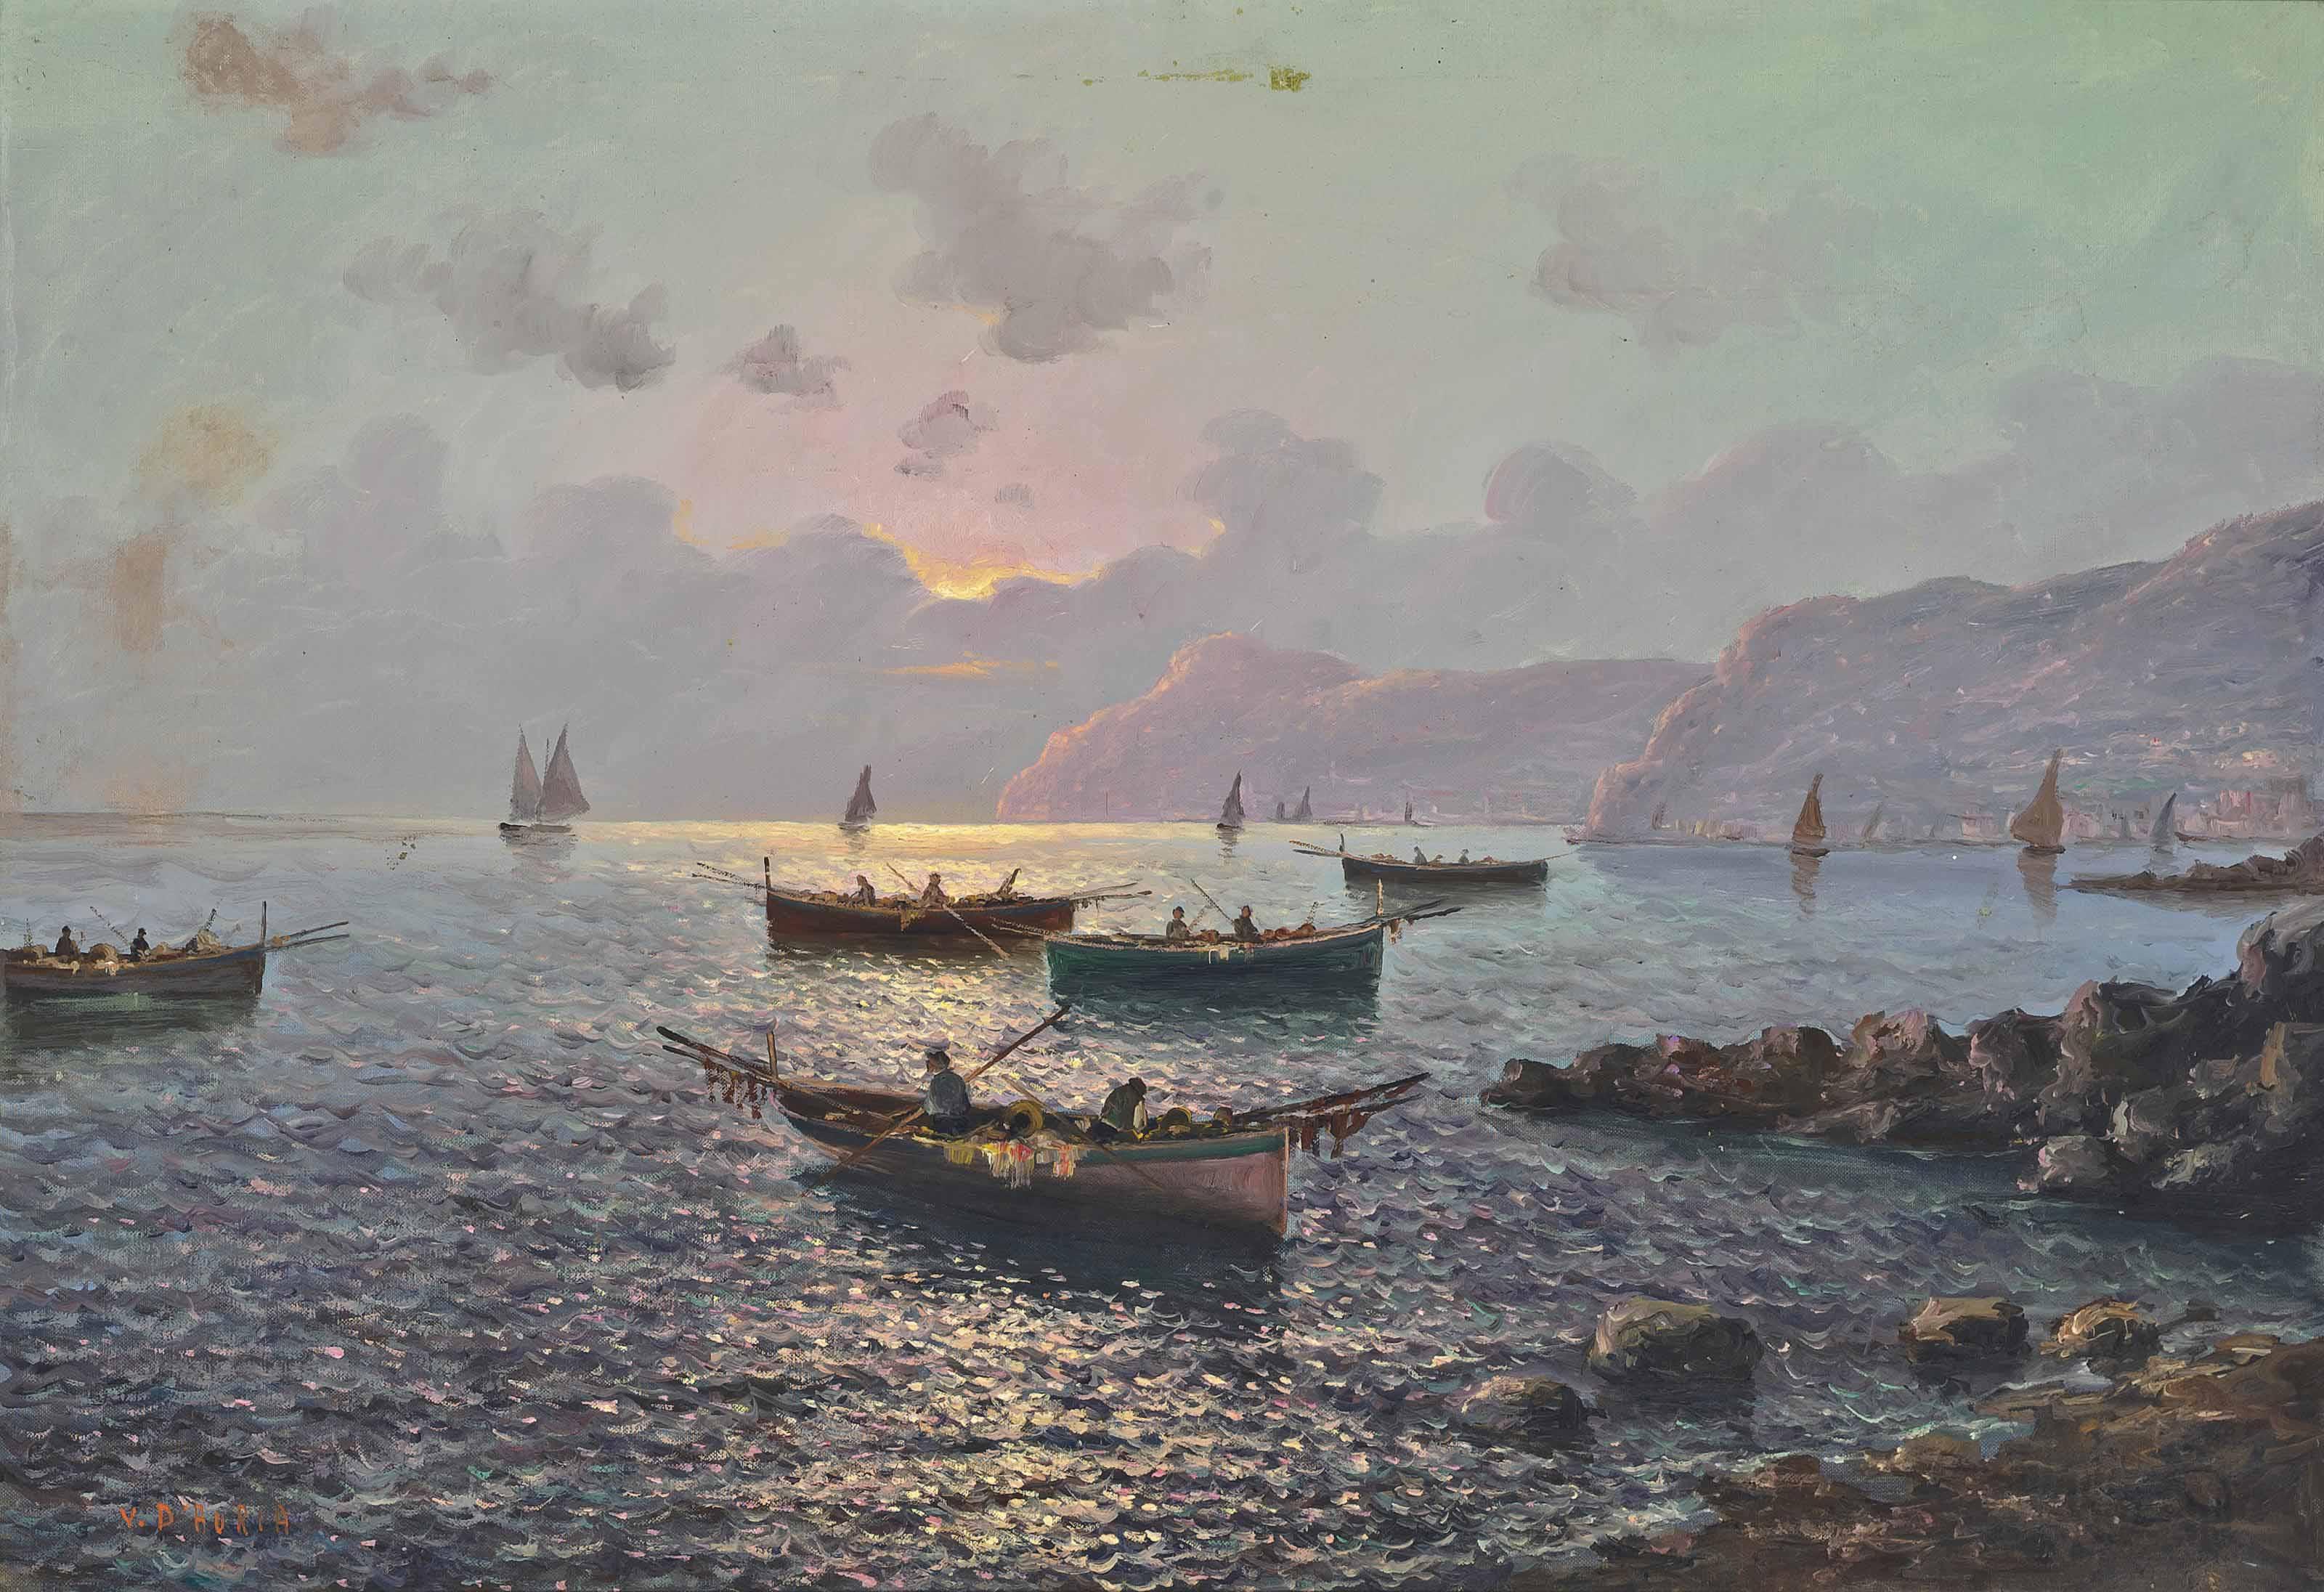 Vincenzo d' Auria (Italian, 1872-1939)